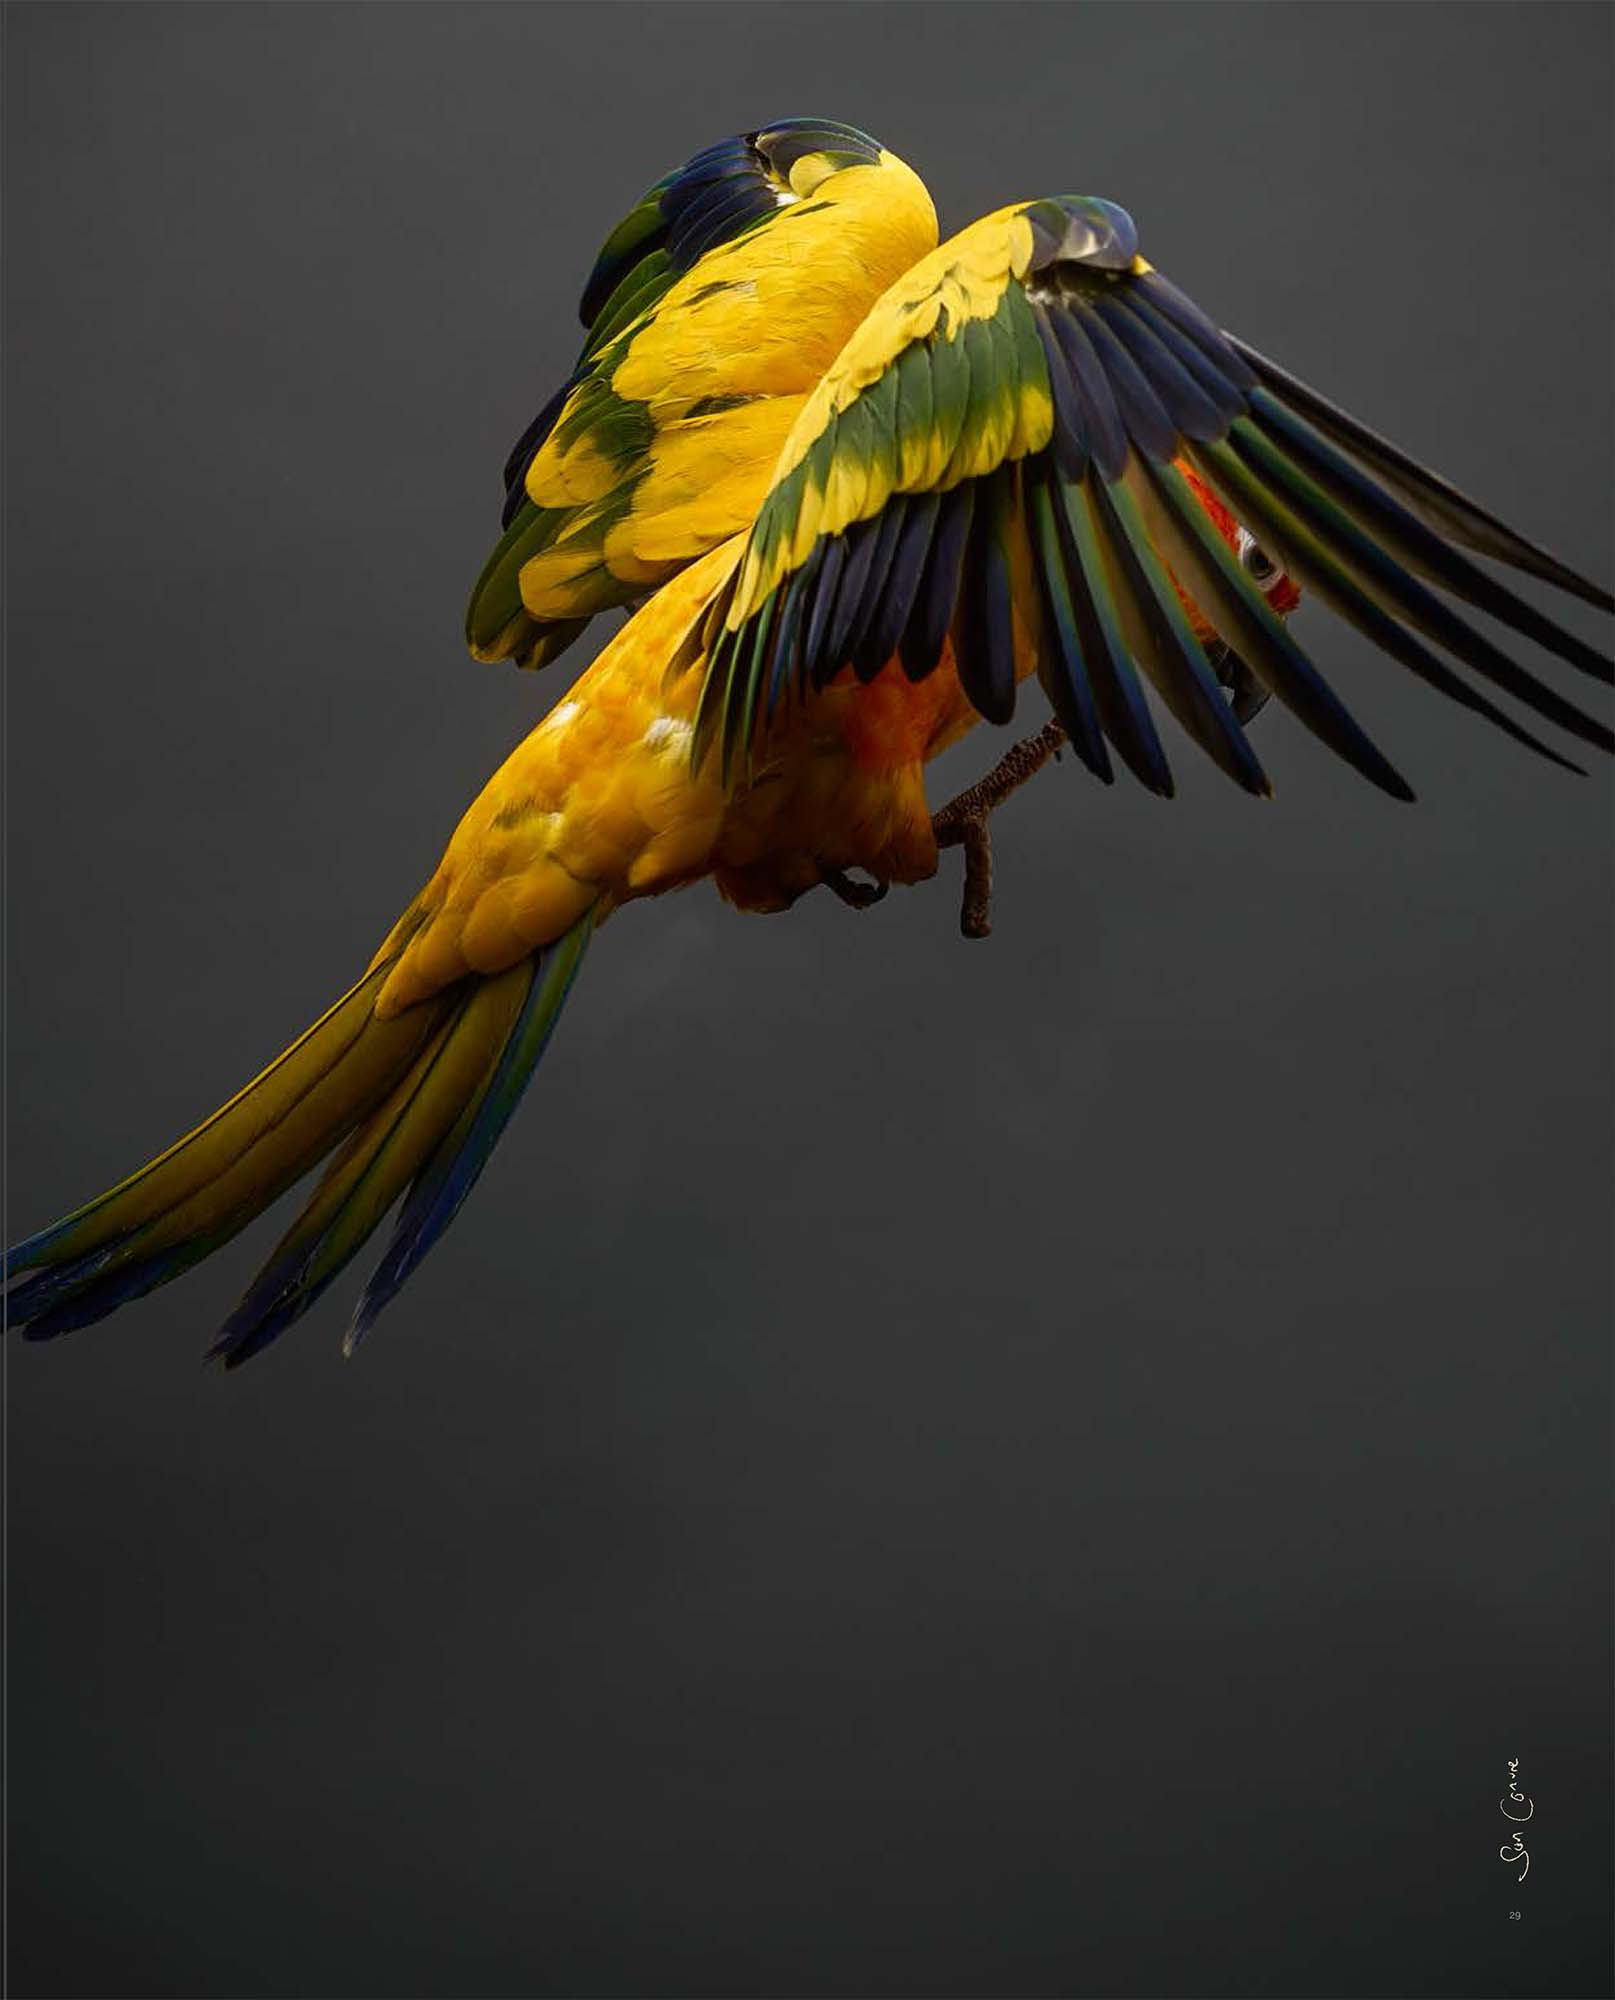 BIRD Gary Heery Book-completemmockup-31.jpg